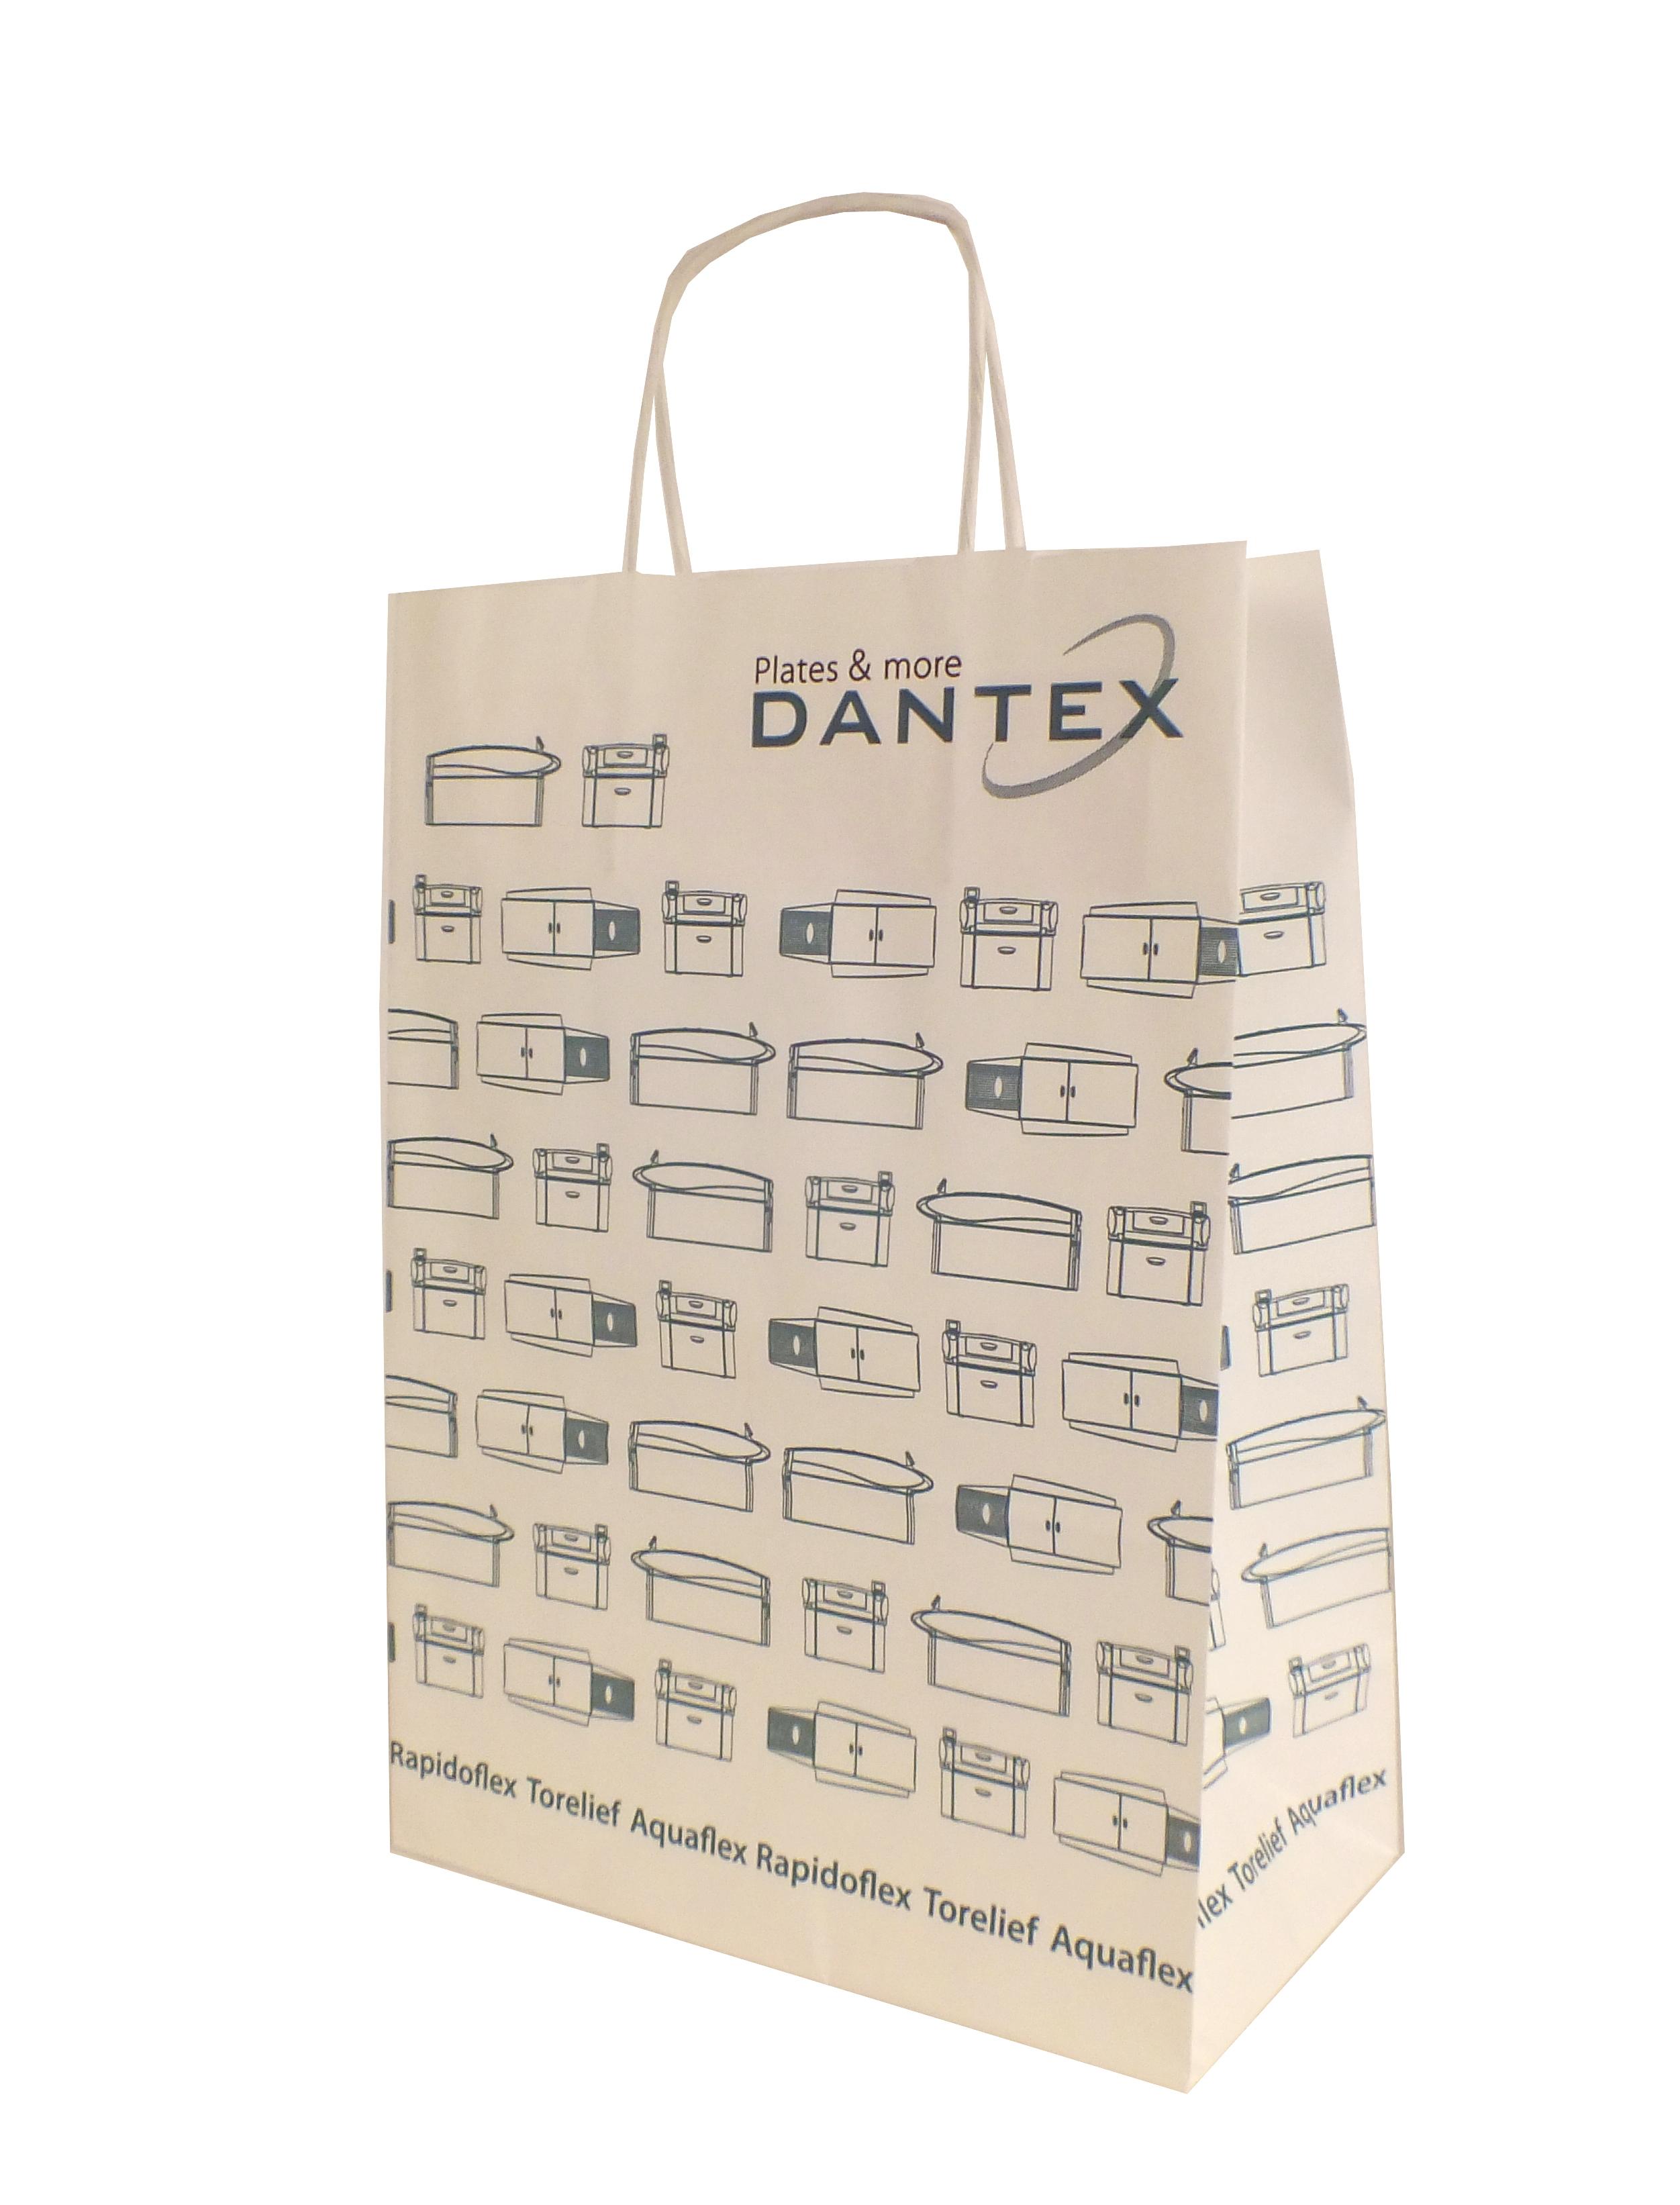 retail bag printing